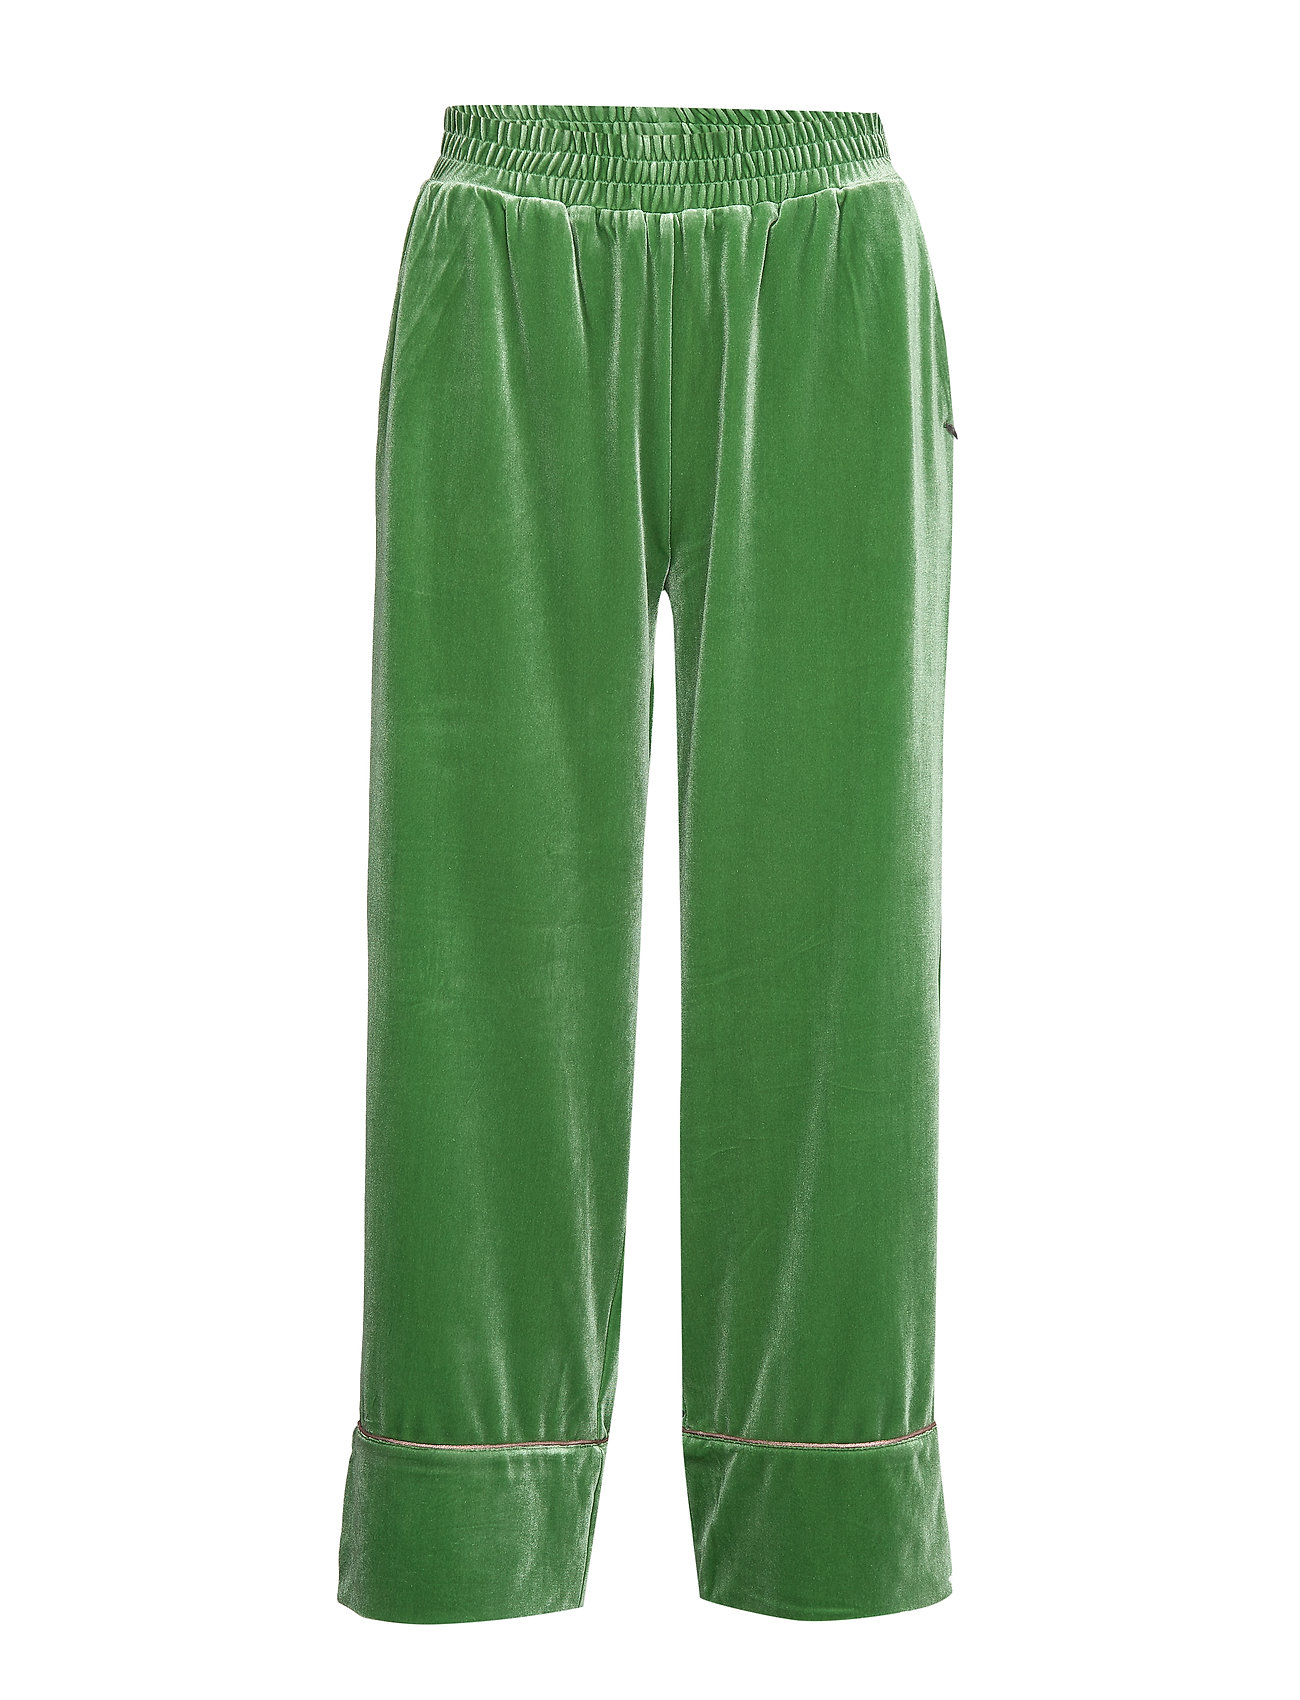 Coster Copenhagen Pants in velour w. piping - FORREST GREEN